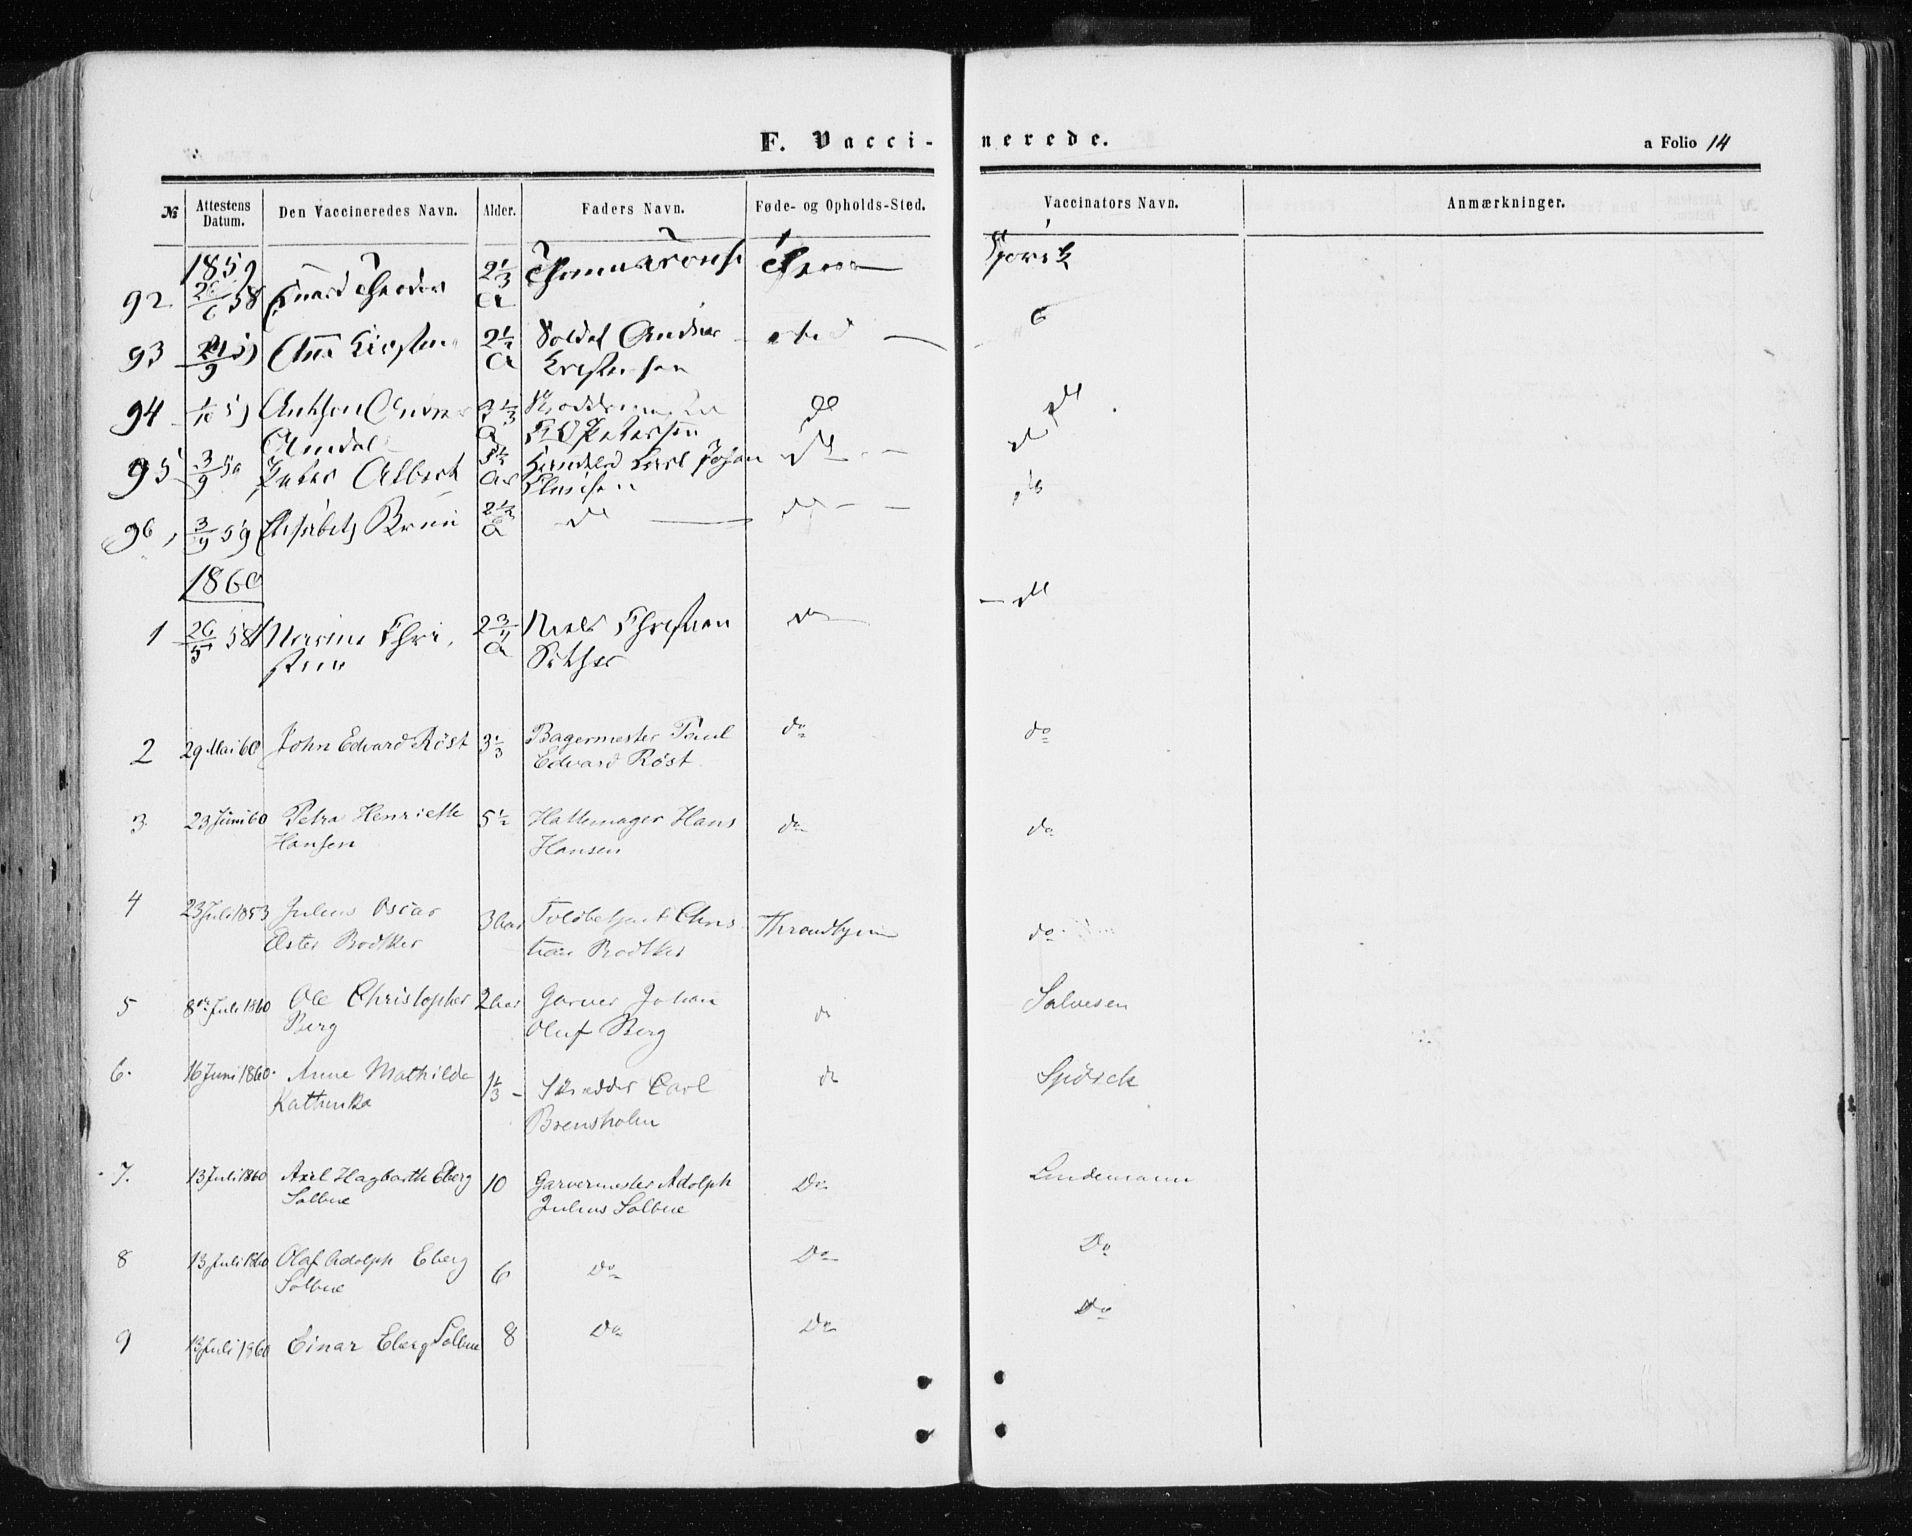 SAT, Ministerialprotokoller, klokkerbøker og fødselsregistre - Sør-Trøndelag, 601/L0053: Parish register (official) no. 601A21, 1857-1865, p. 14